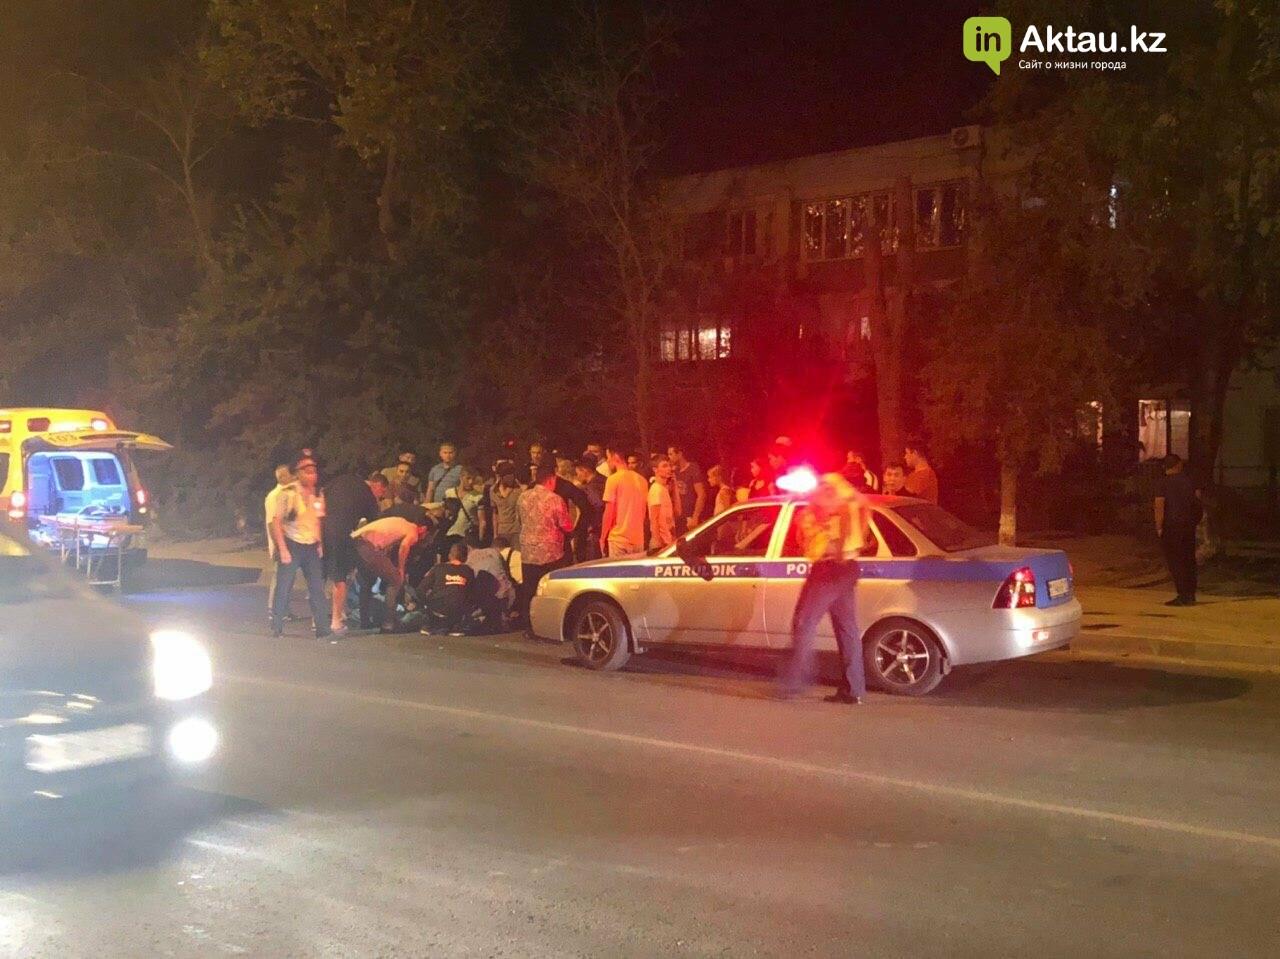 Мотоциклист пострадал в аварии в Актау (ВИДЕО), фото-4